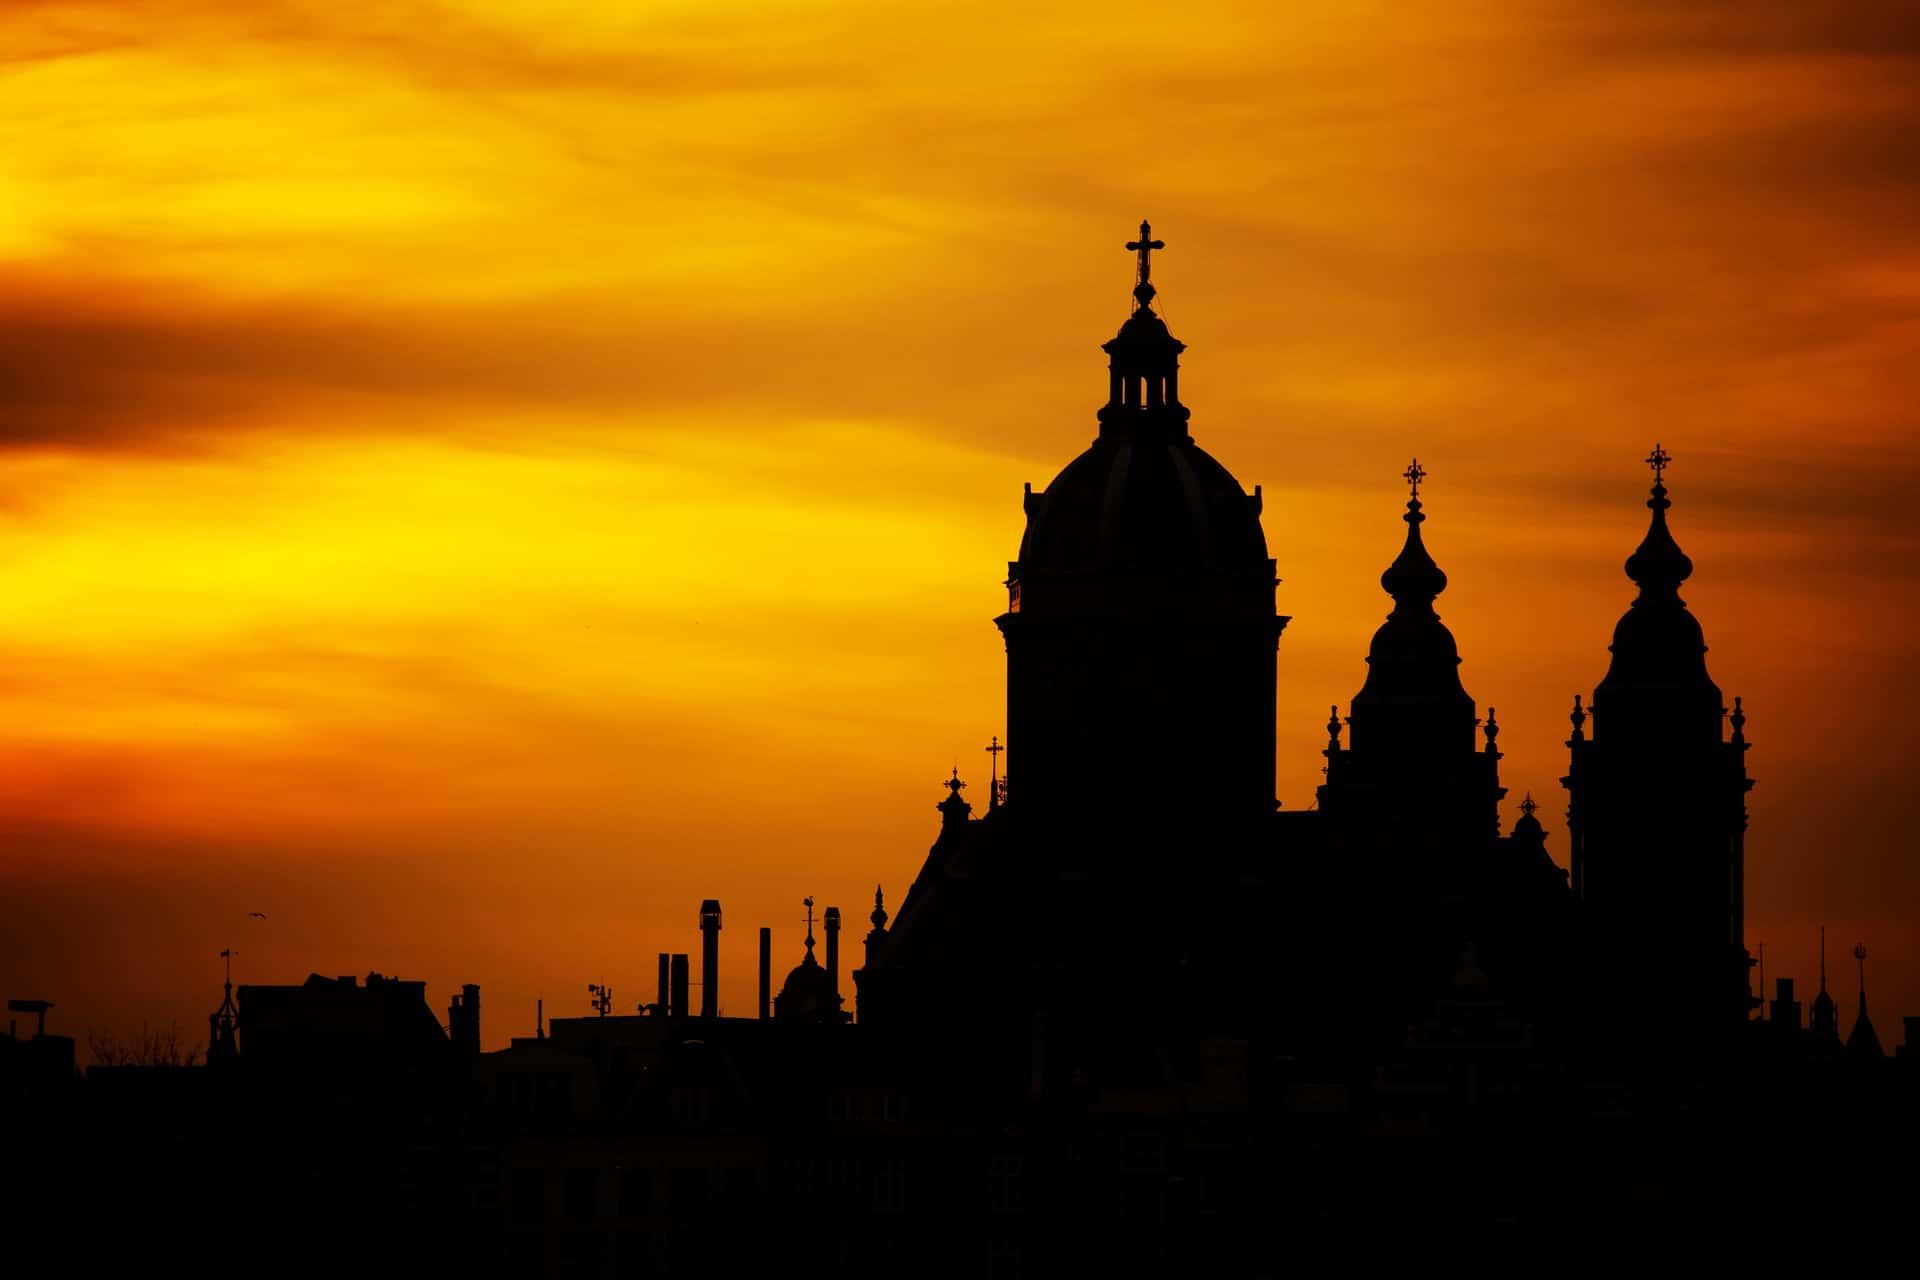 silhouette fotografia, silhouette, skyline